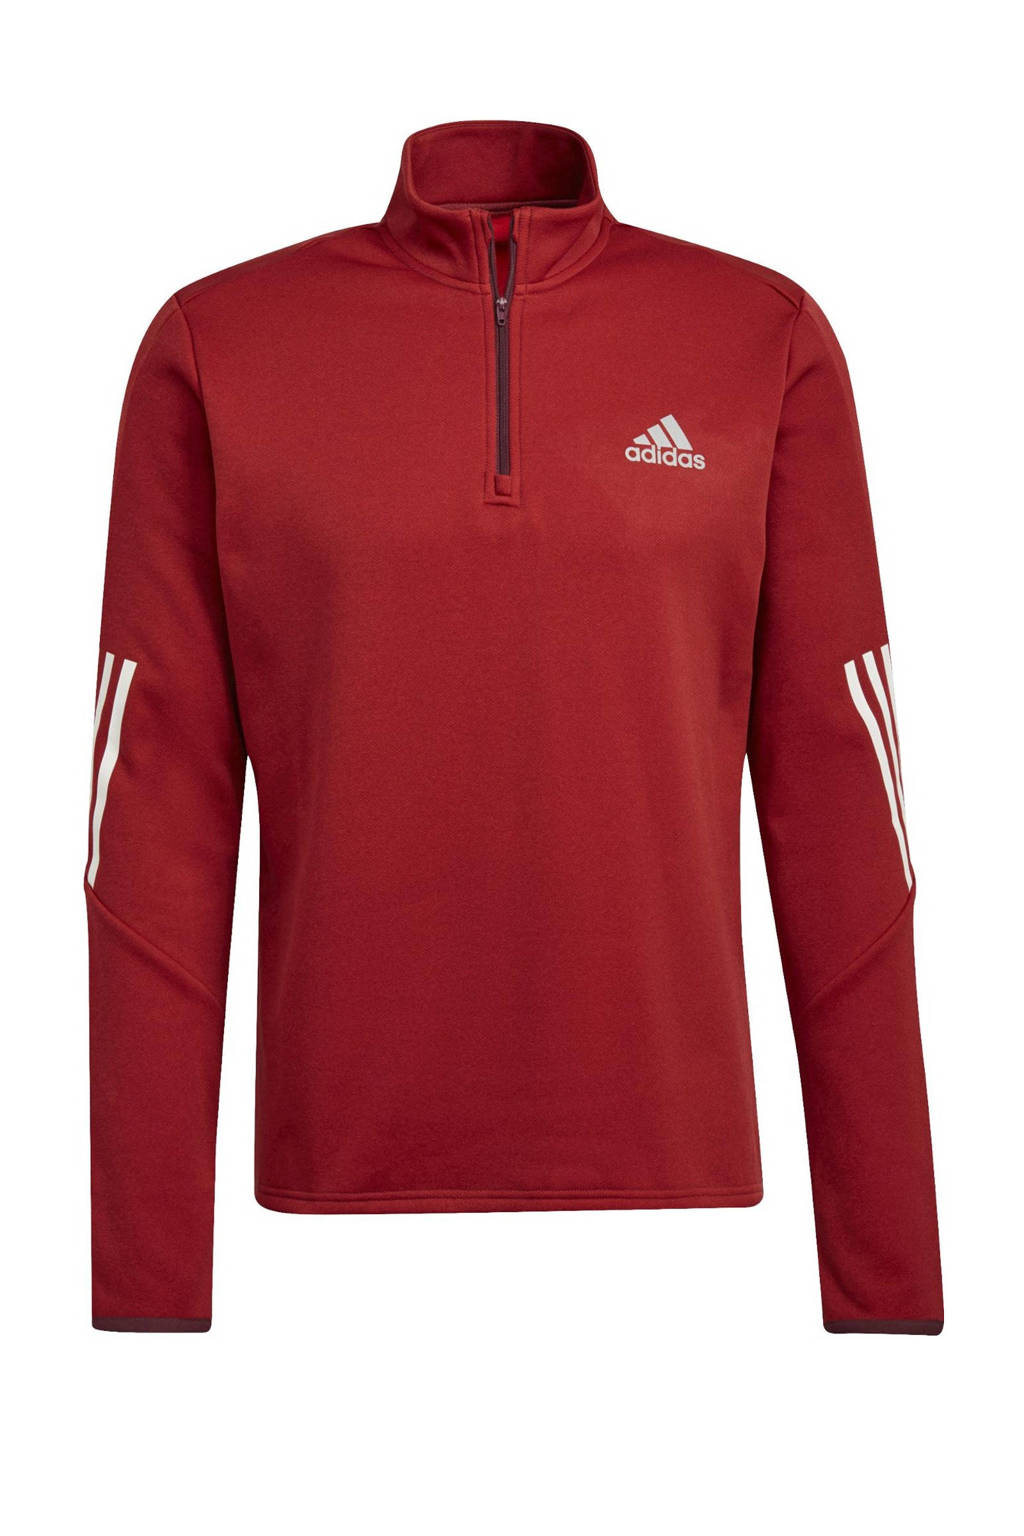 adidas Performance   sport T-shirt donkerrood, Donkerrood